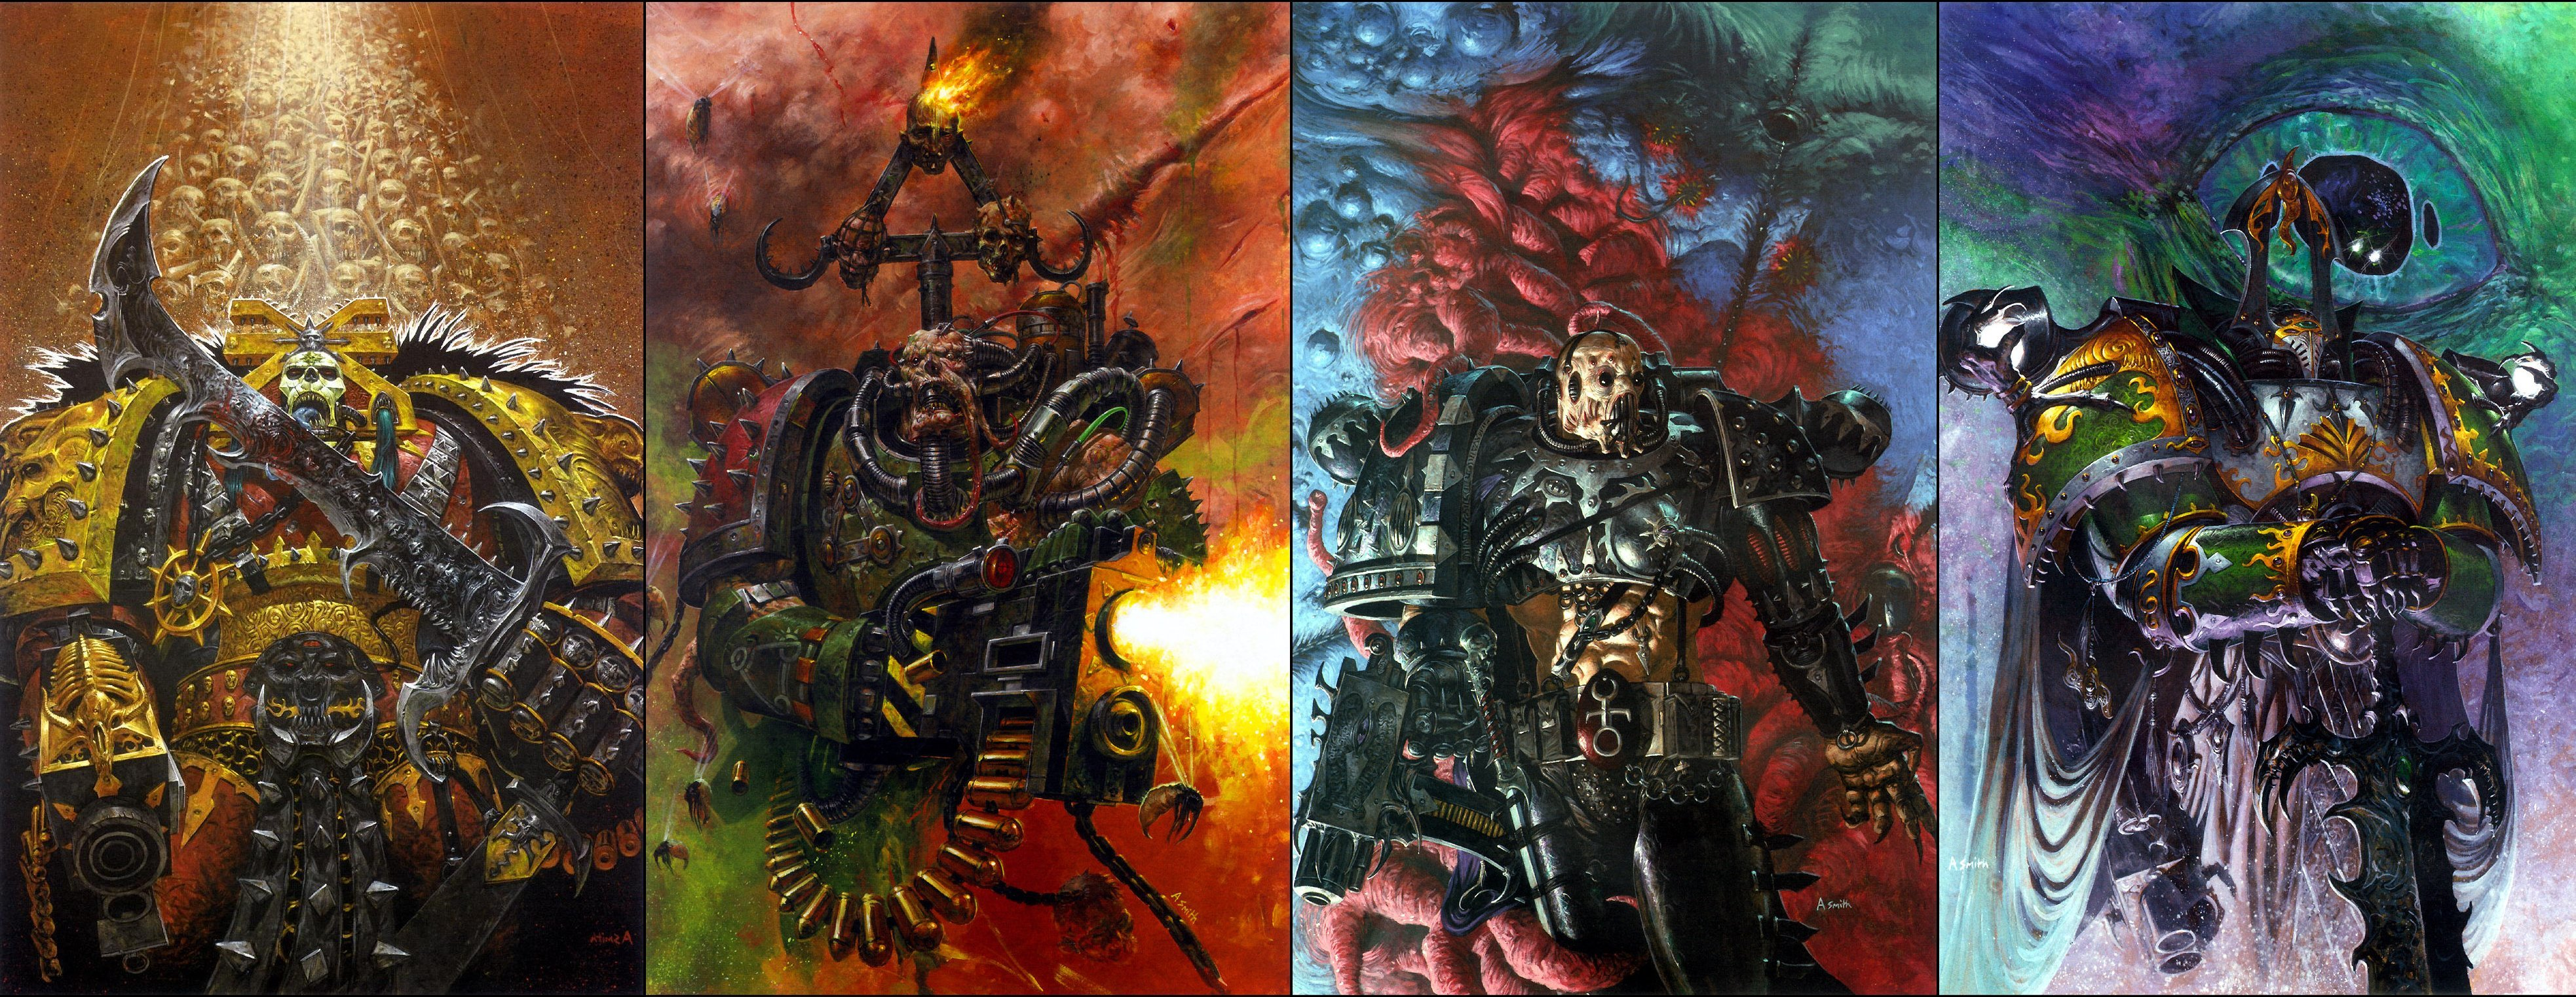 Warhammer Chaos Nurgle Slaanesh